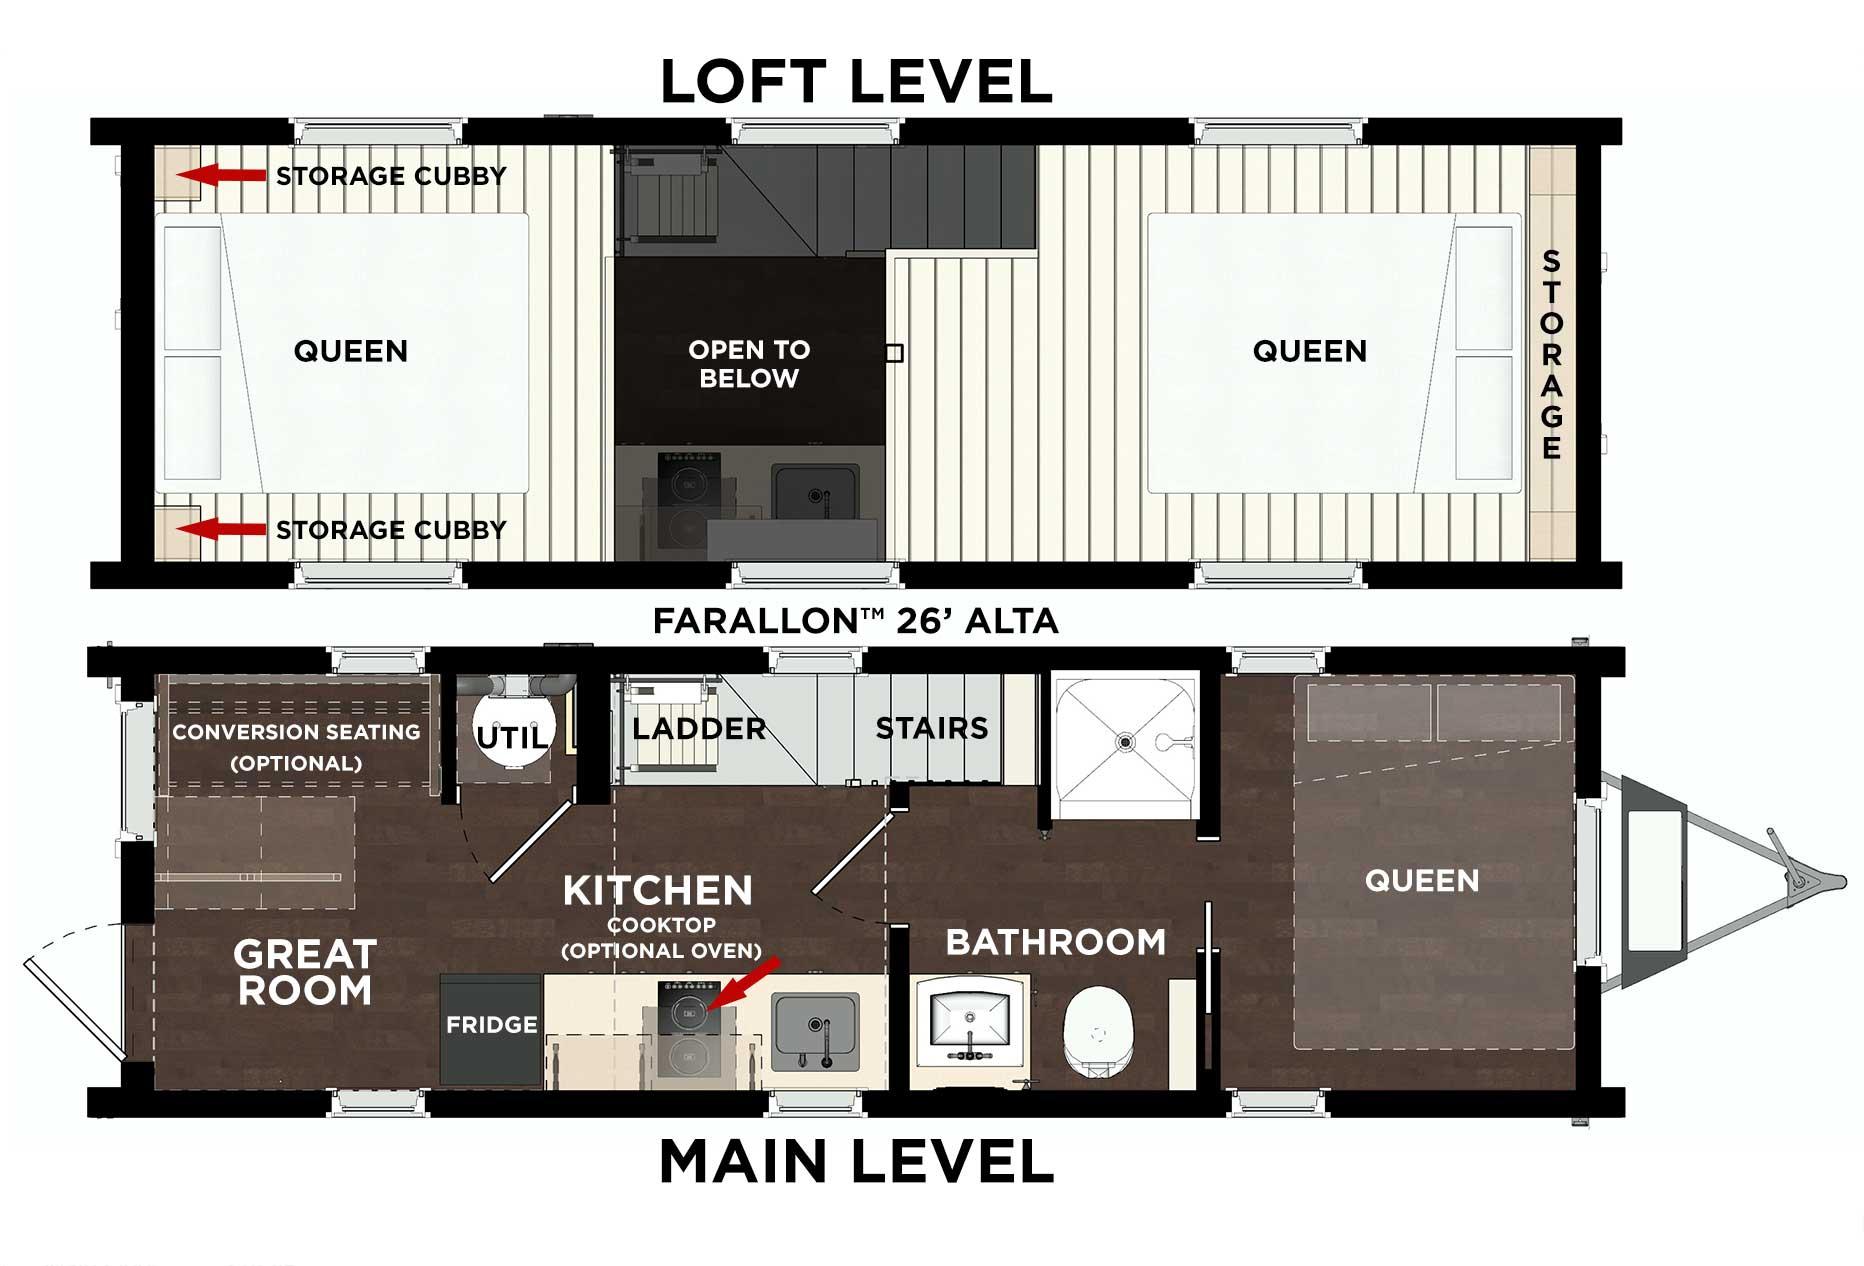 Farallon Alta L2 Floor Plan